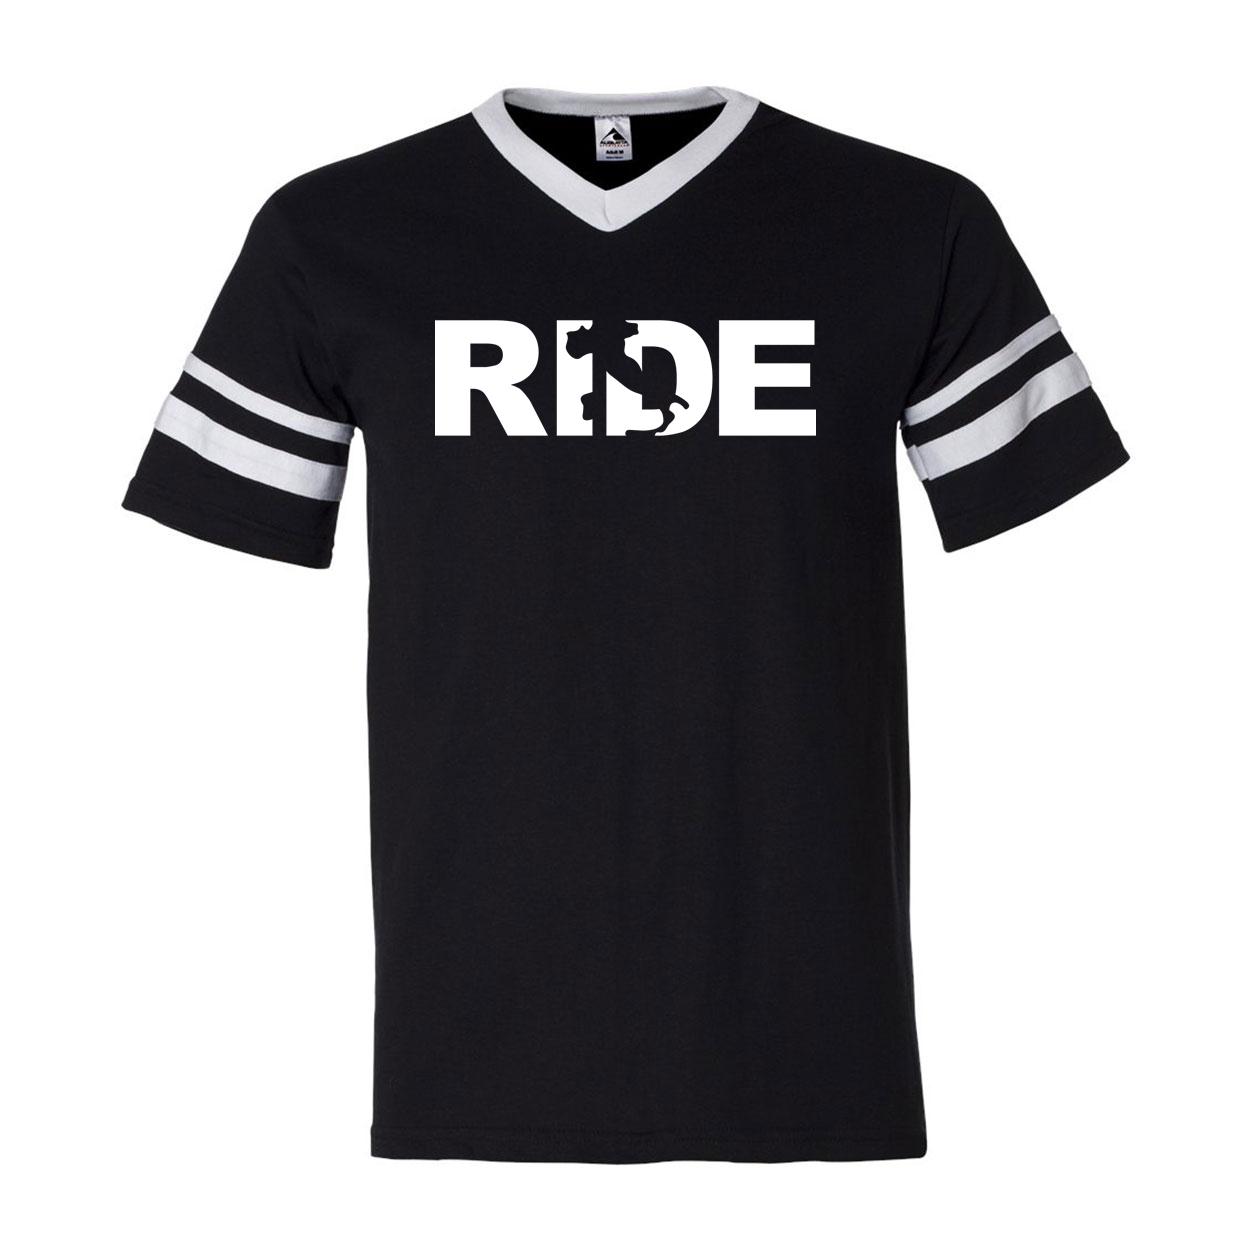 Ride Italy Classic Premium Striped Jersey T-Shirt Black/White (White Logo)